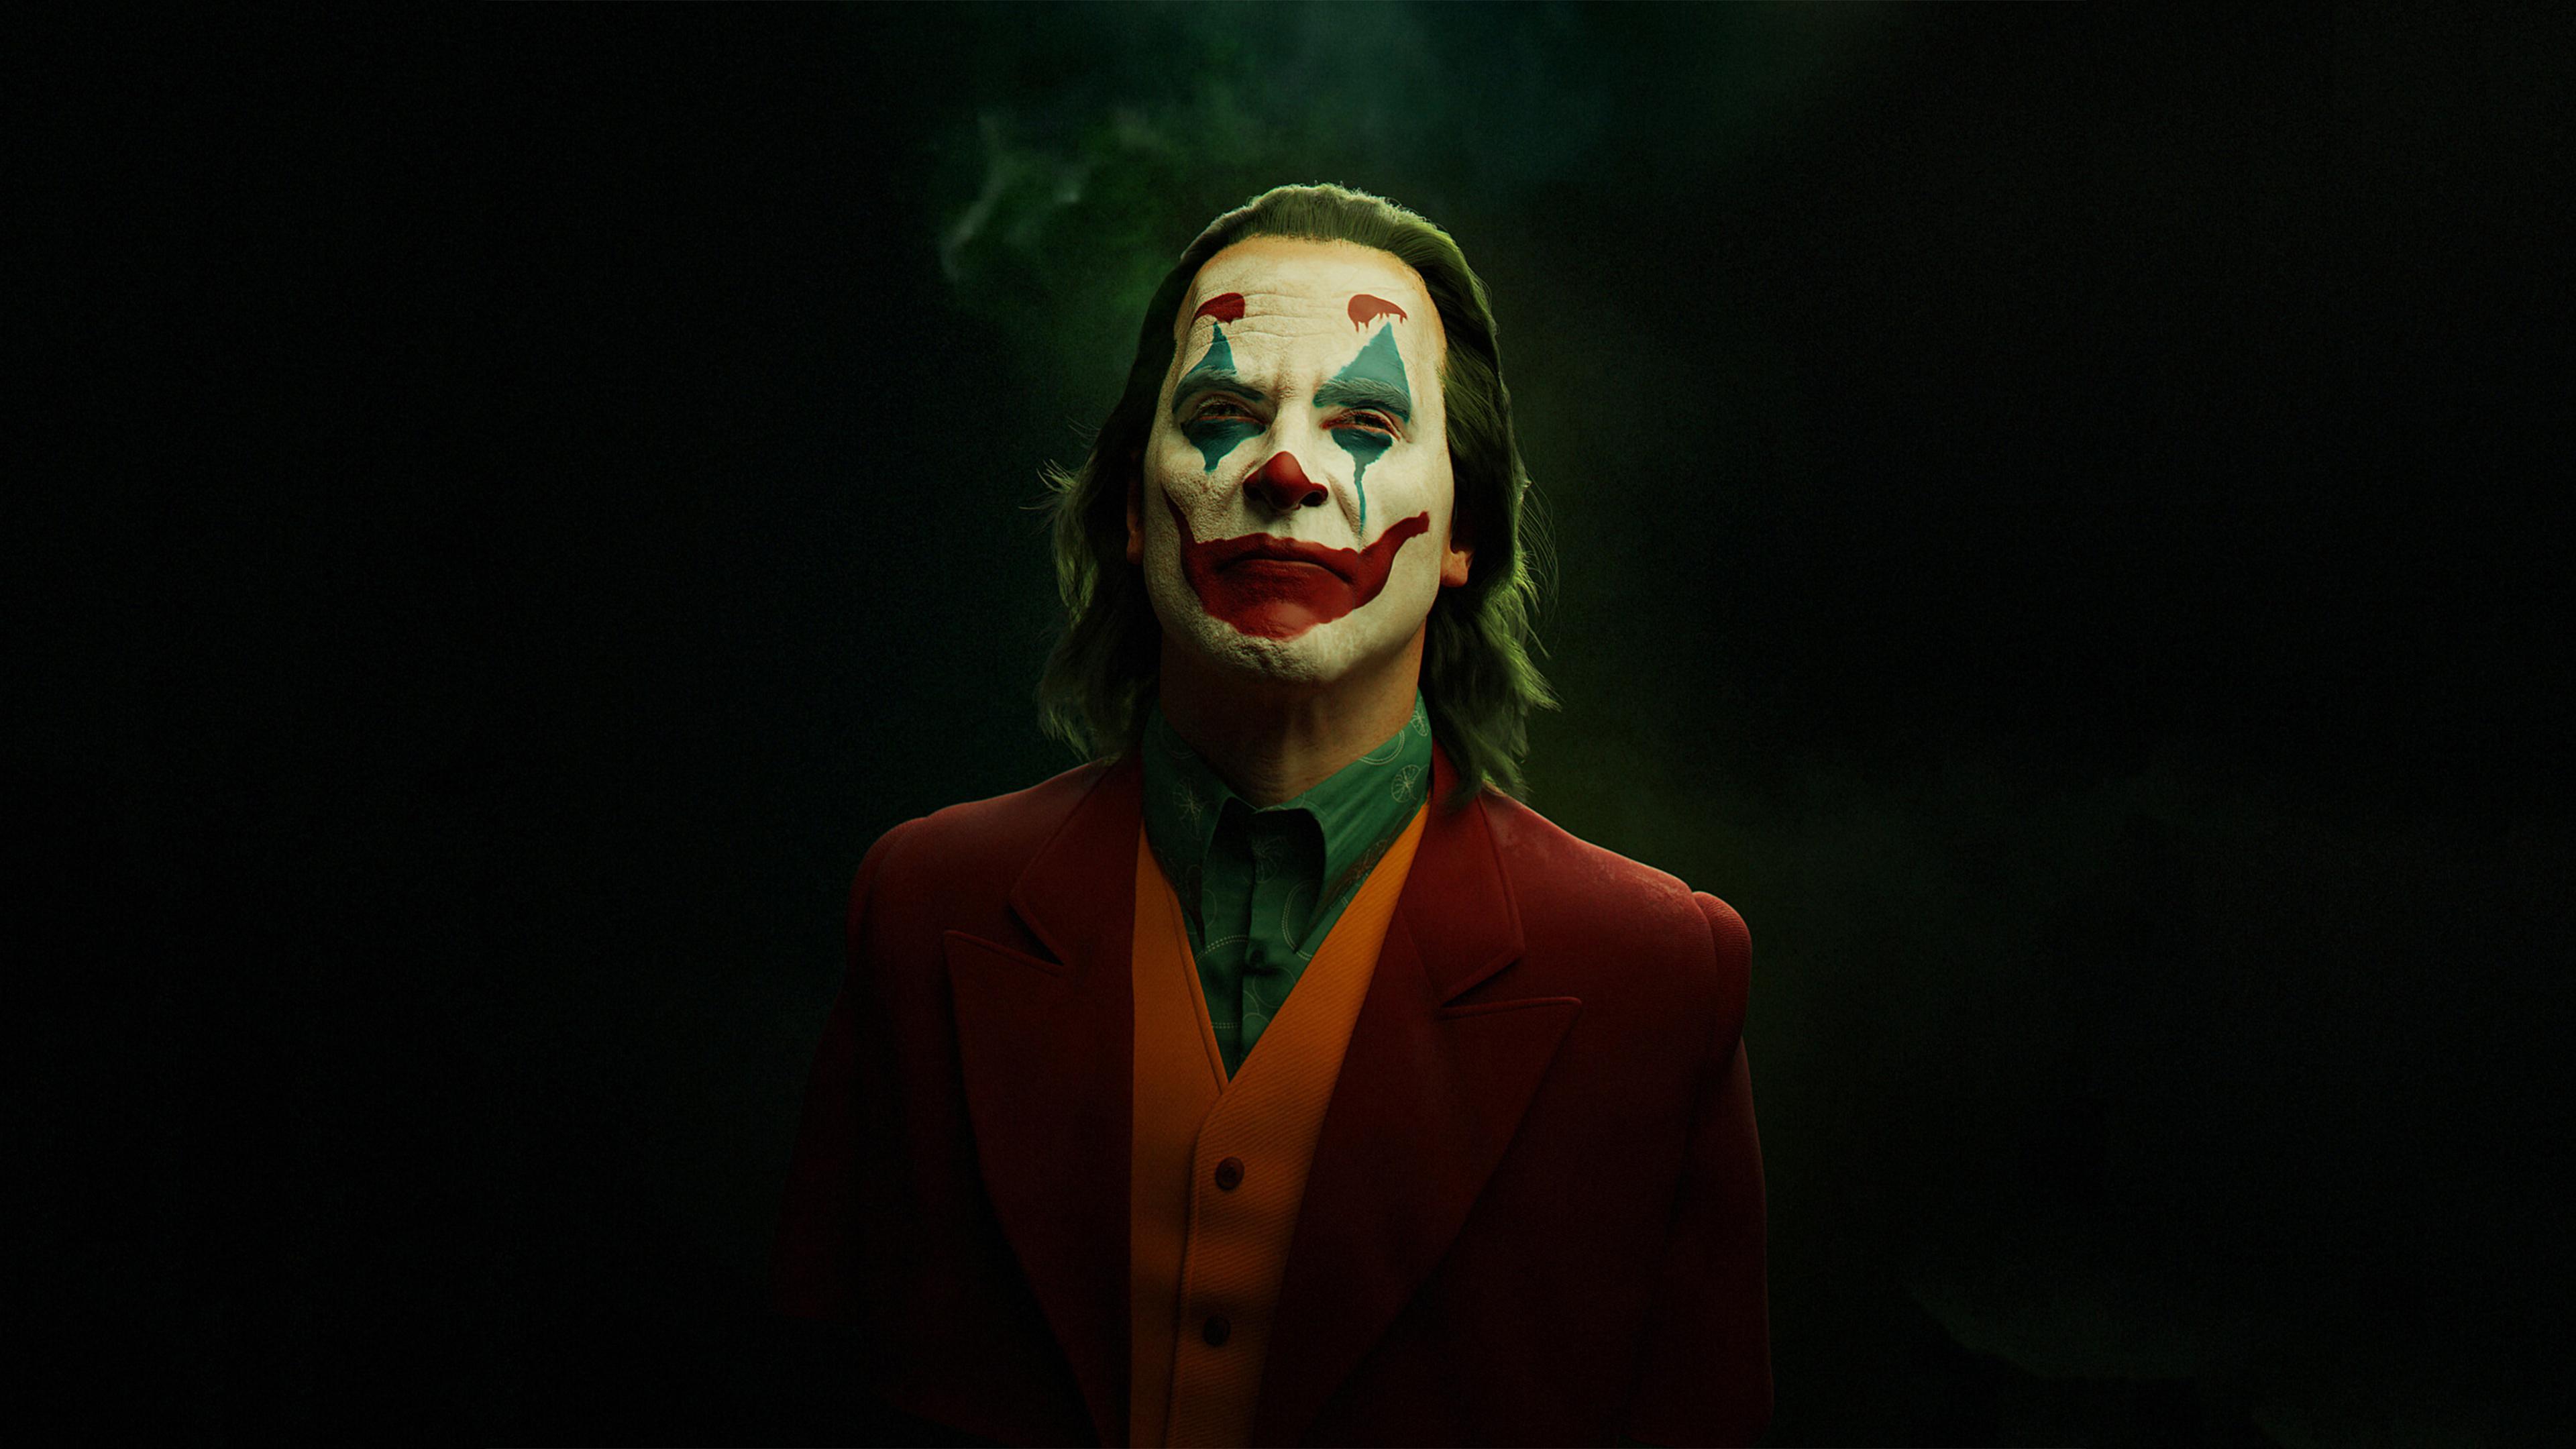 Joker 4K 2020 Wallpaper, HD Superheroes 4K Wallpapers ...